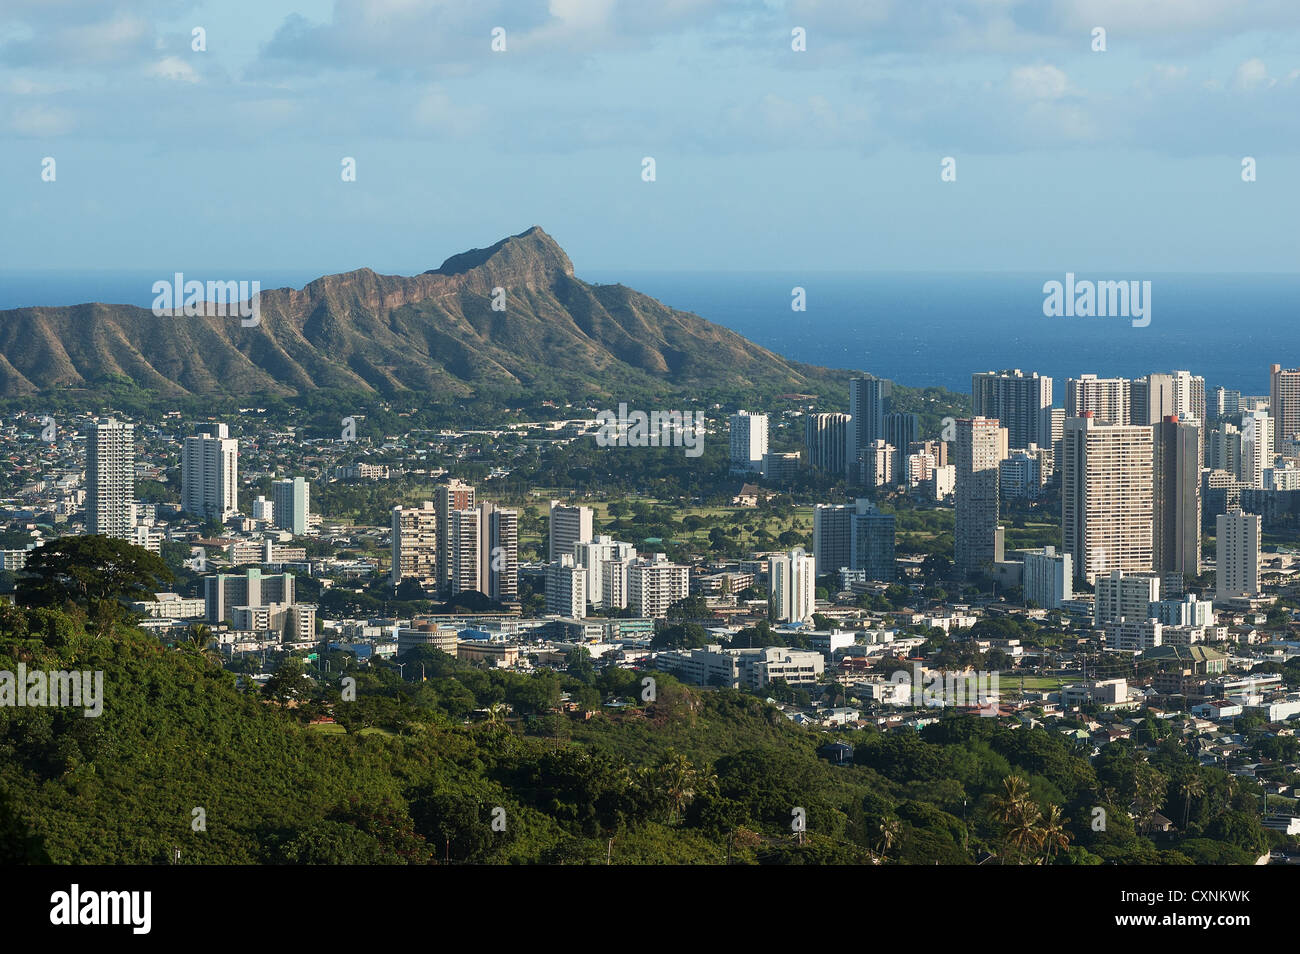 Elk284-1652 Hawaii, Oahu, Honolulu, Waikiki with Diamond Head Stock Photo